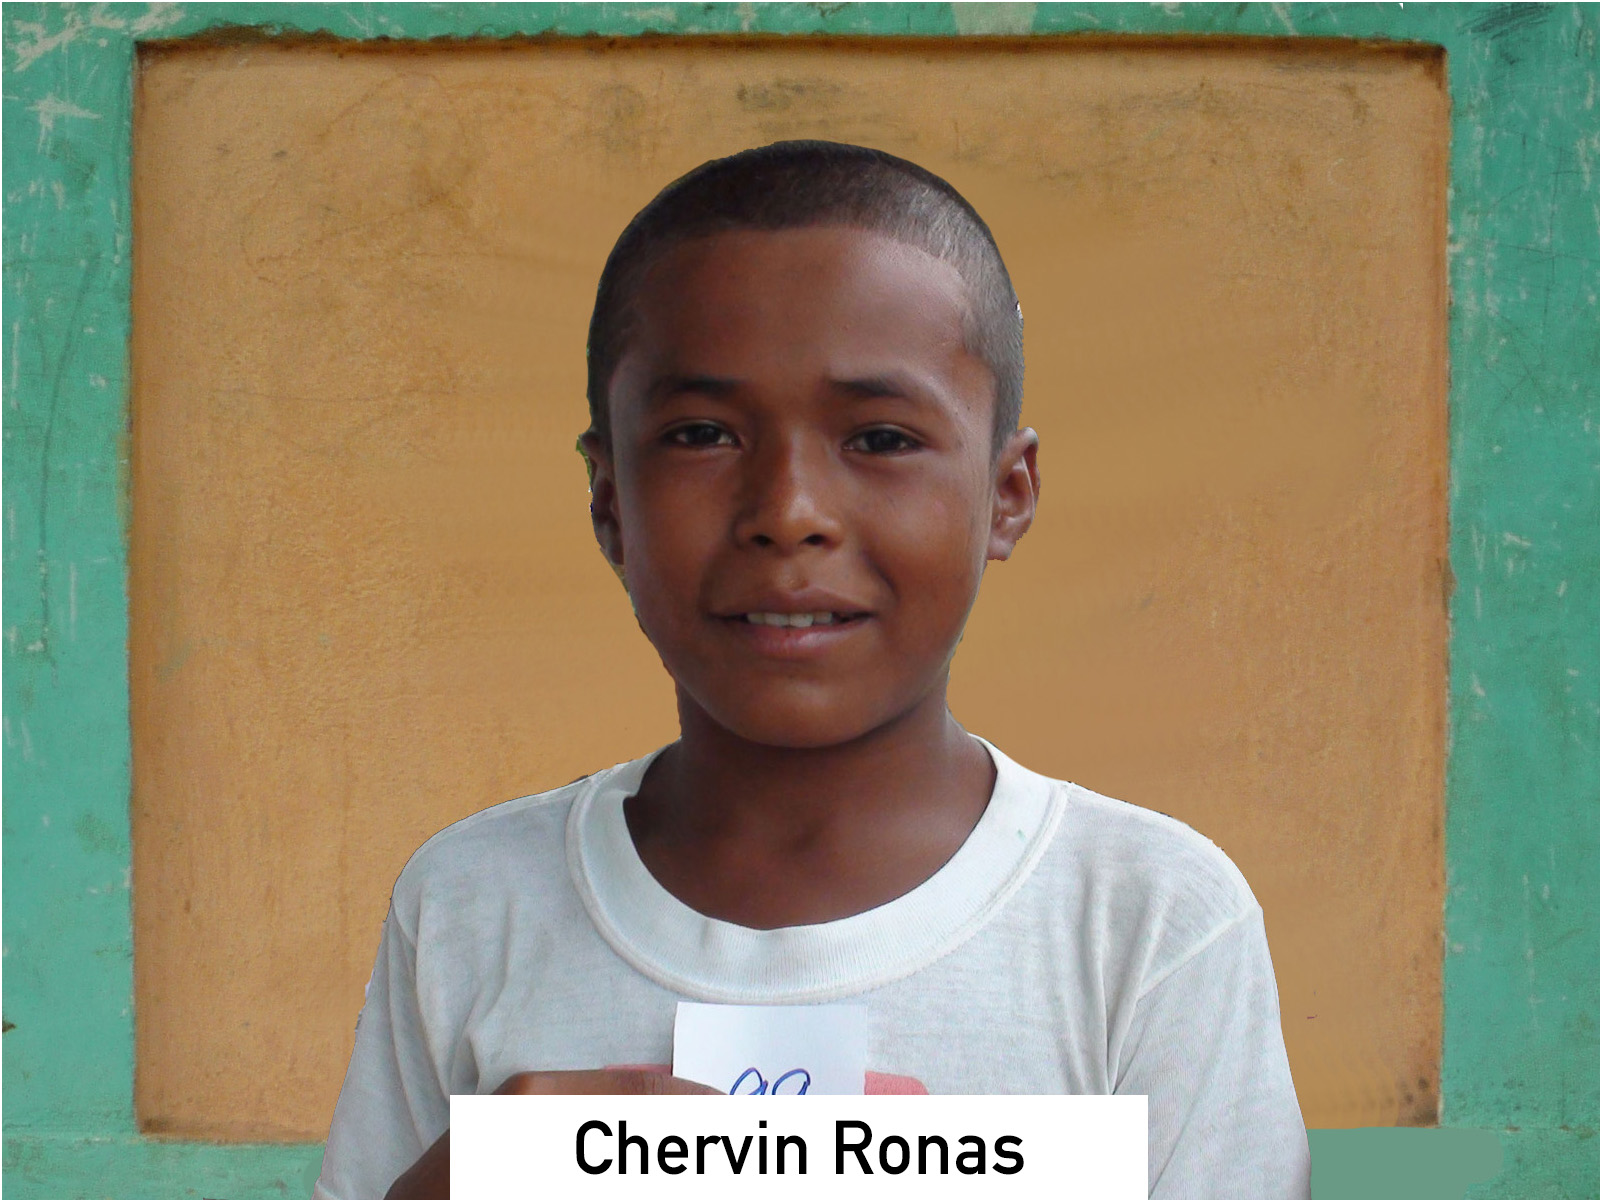 099 - Chervin Ronas.jpg